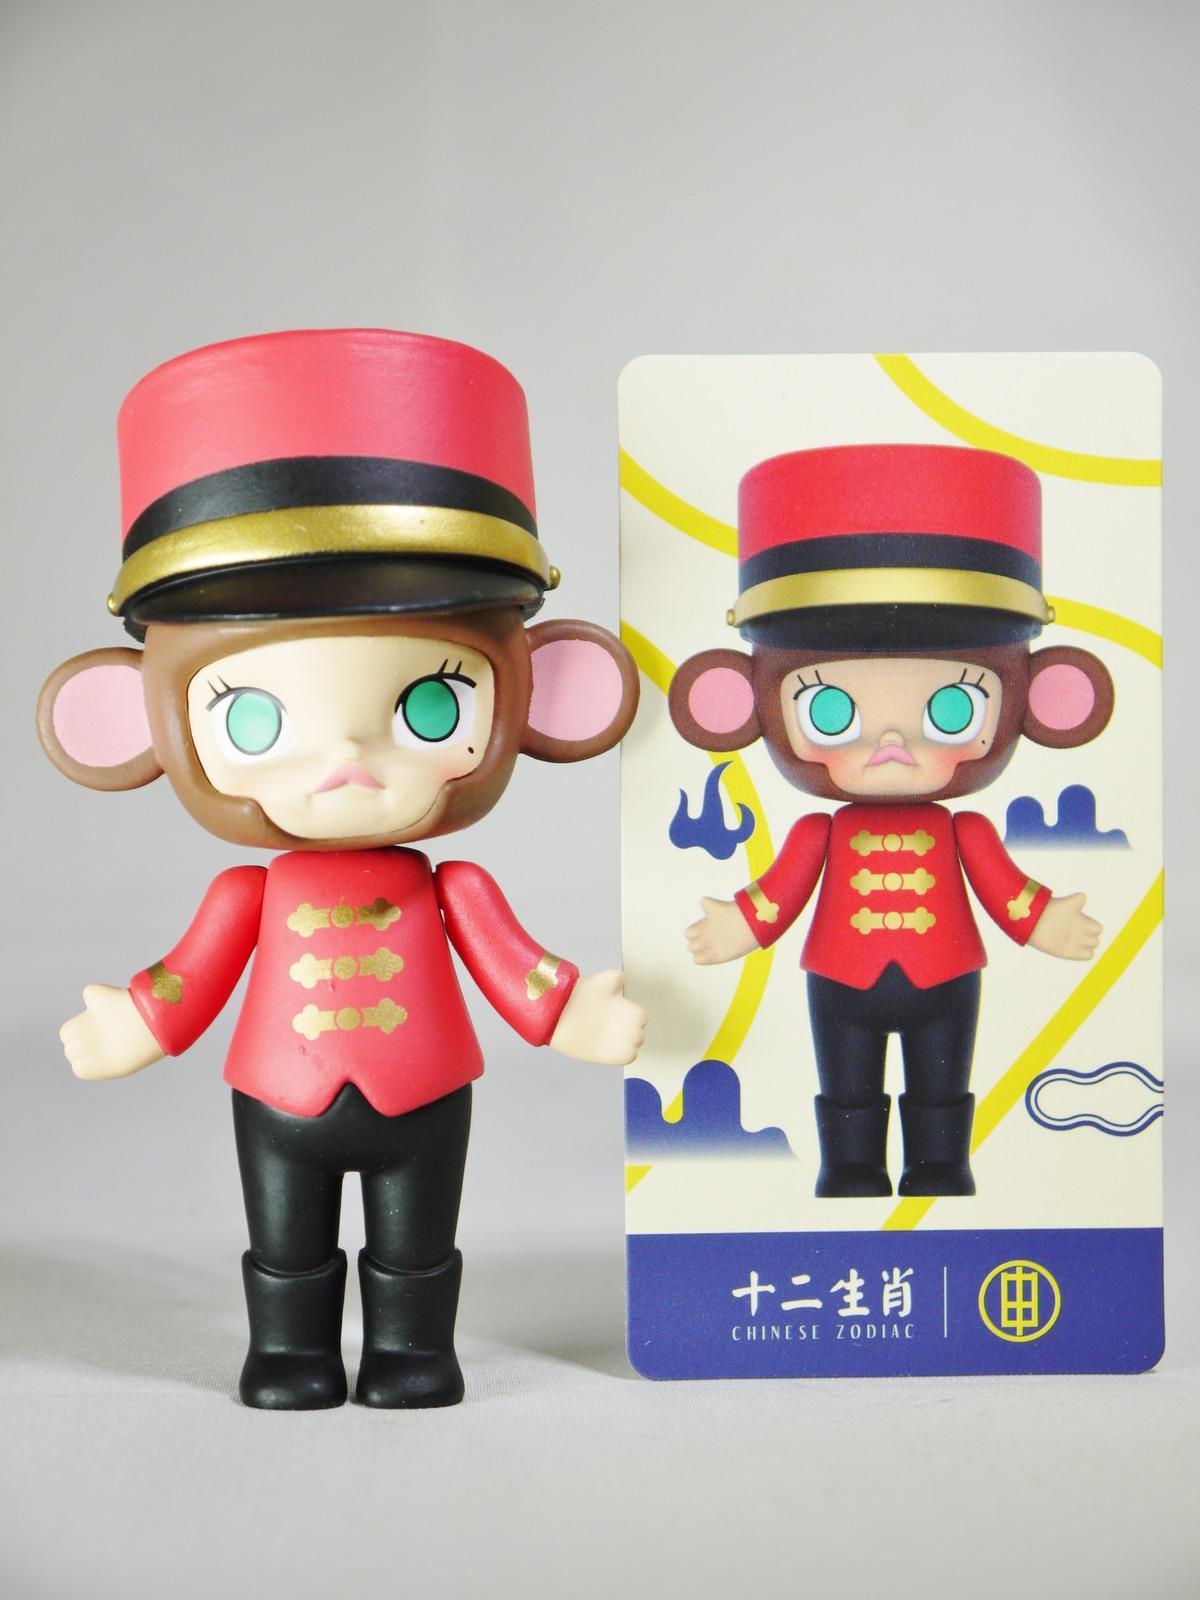 POP MART Kennyswork BLOCK Little Molly Chinese Zodiac Monkey Porter Mini Figure